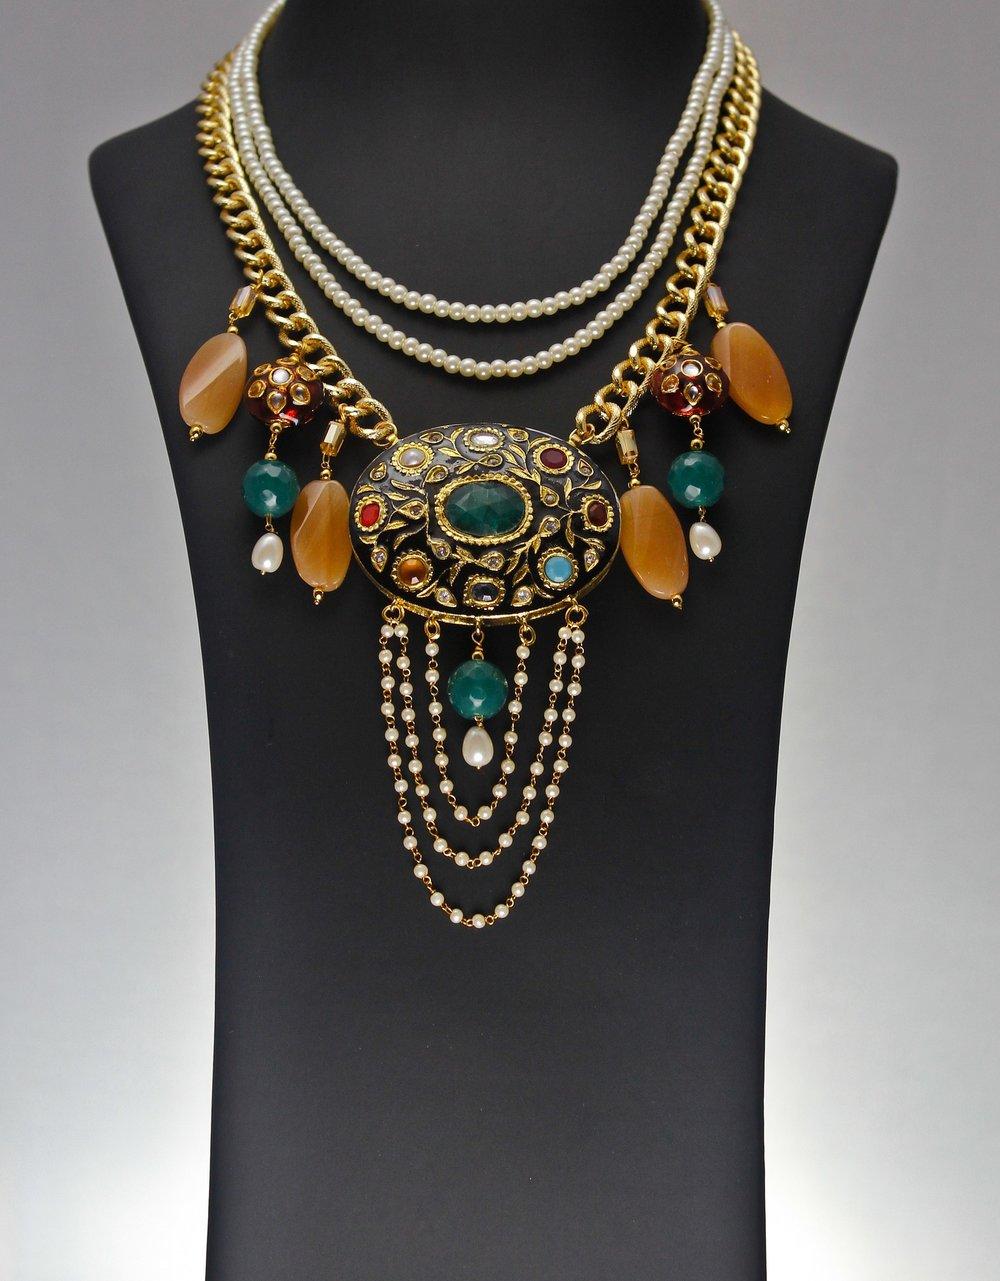 stone-jewelry-1198248_1920.jpg